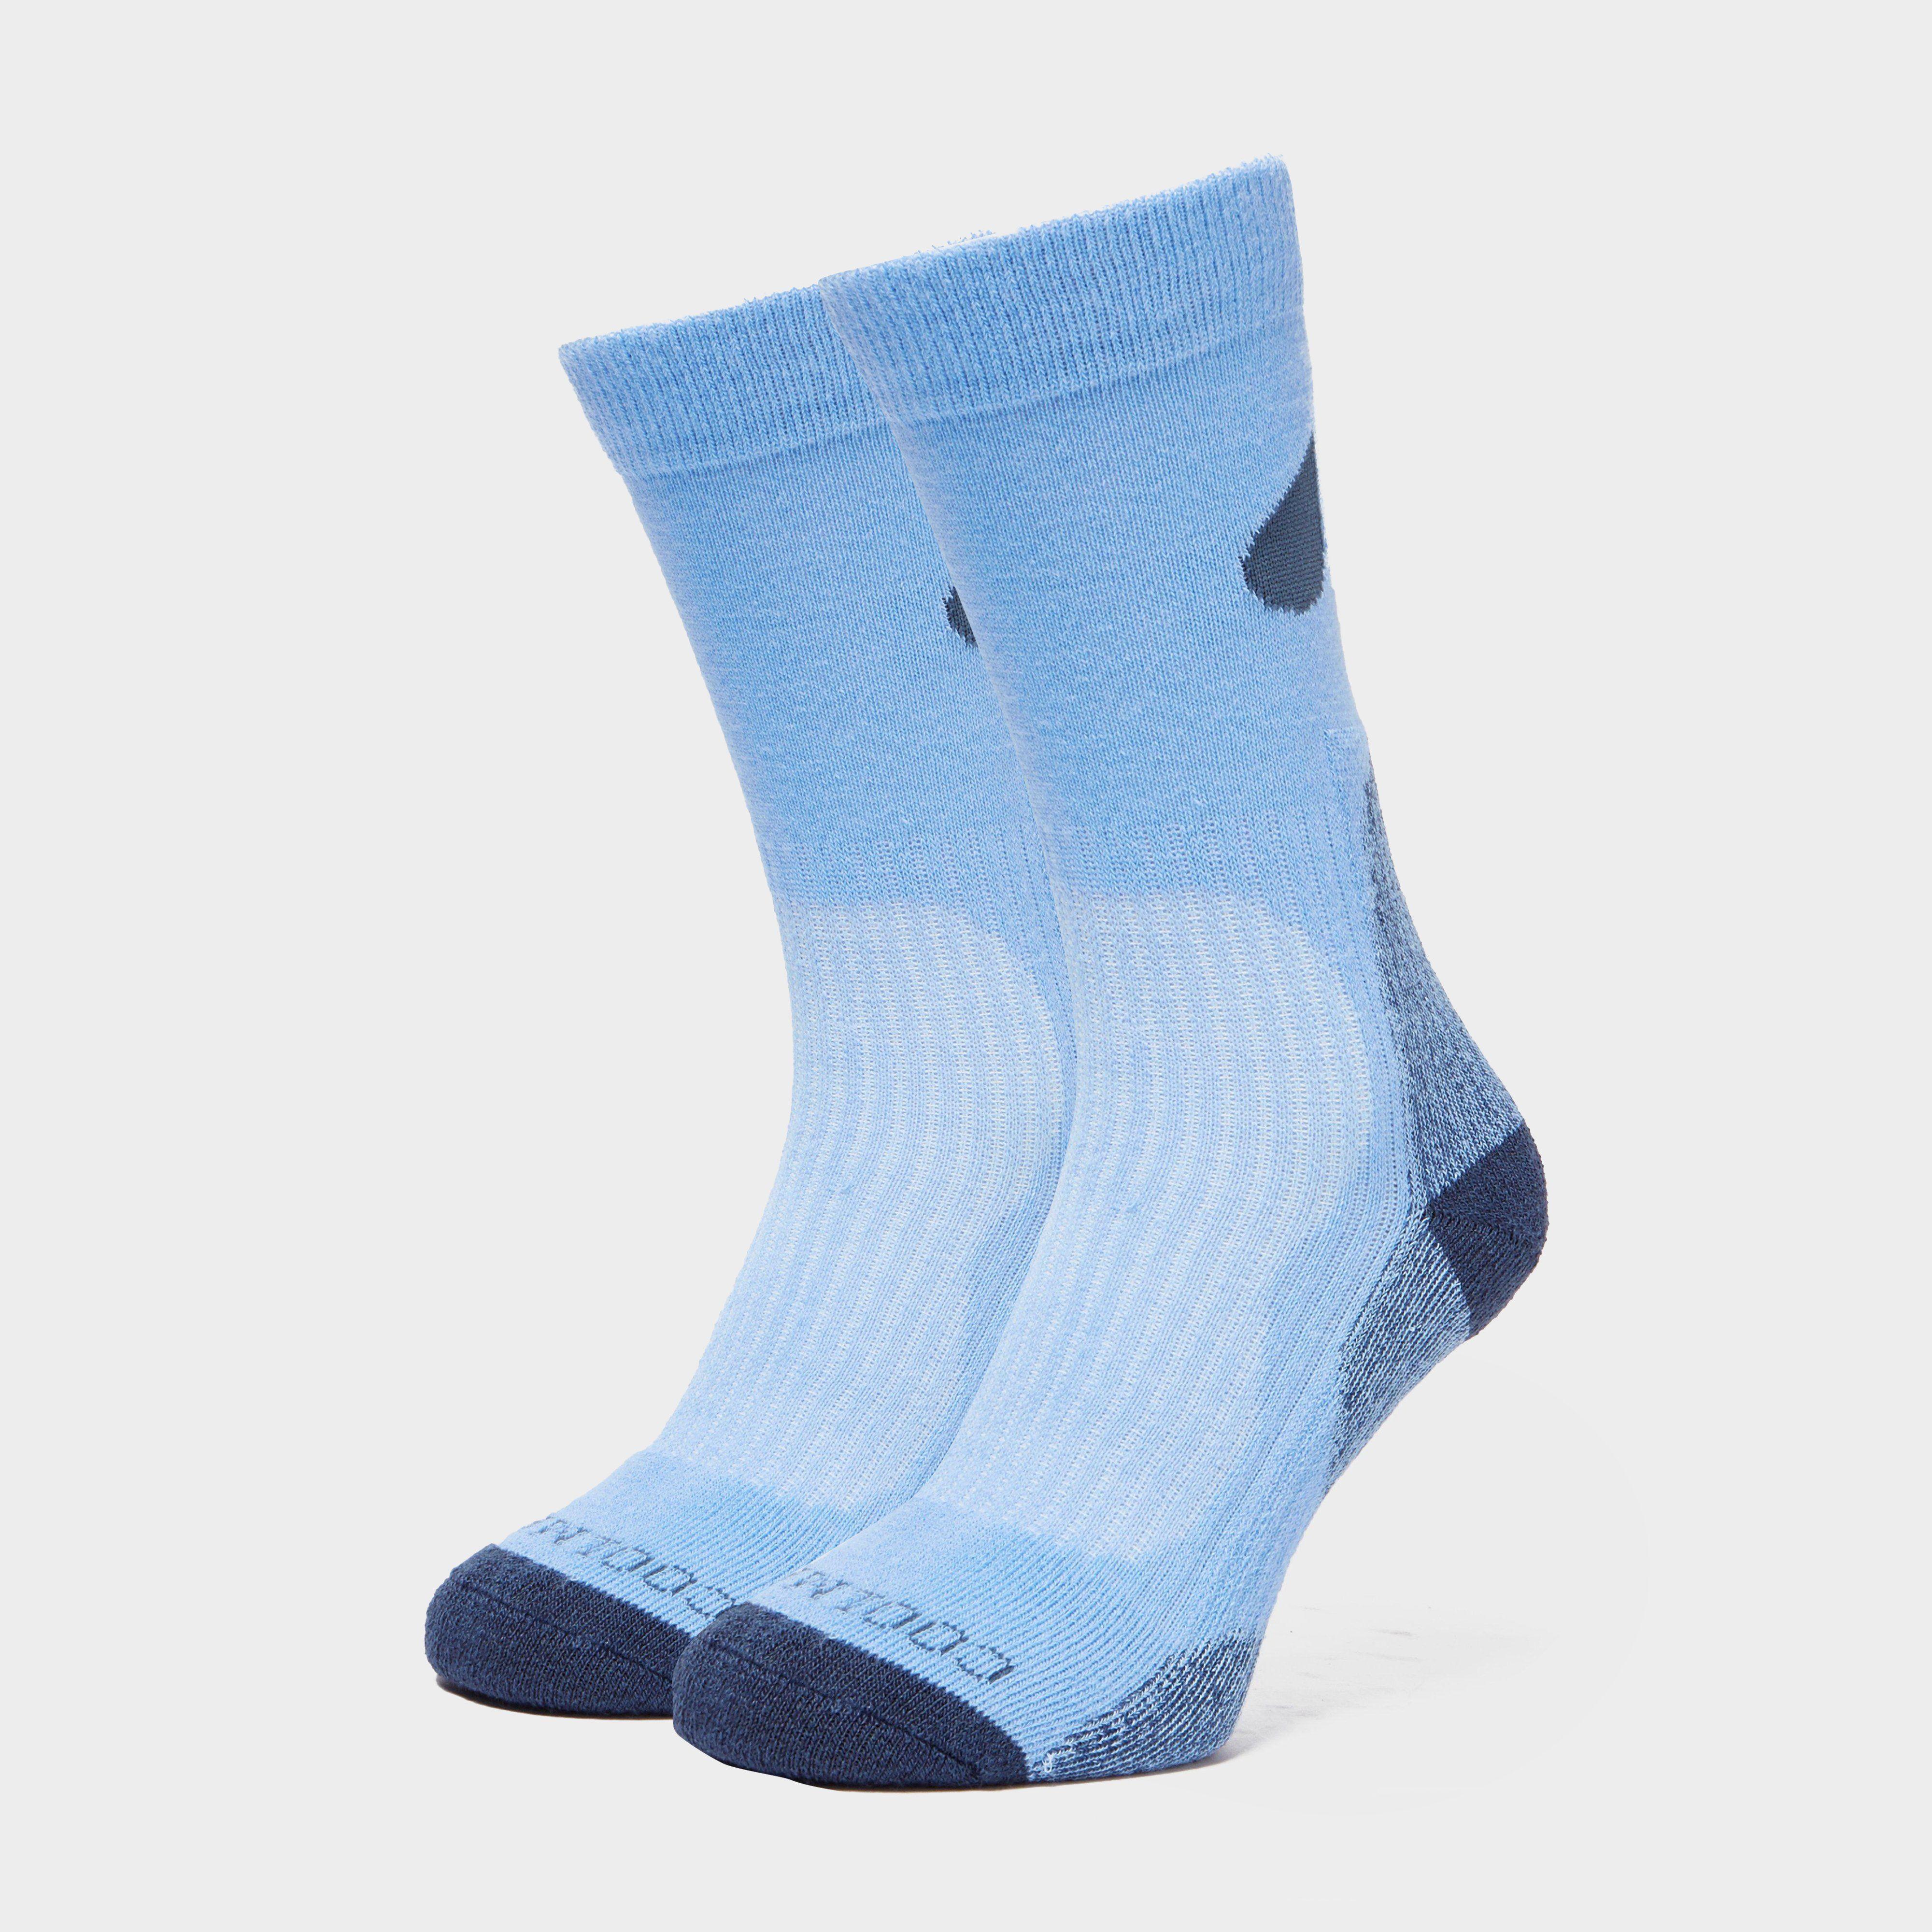 PETER STORM Lightweight Outdoor Sock - 2 Pack